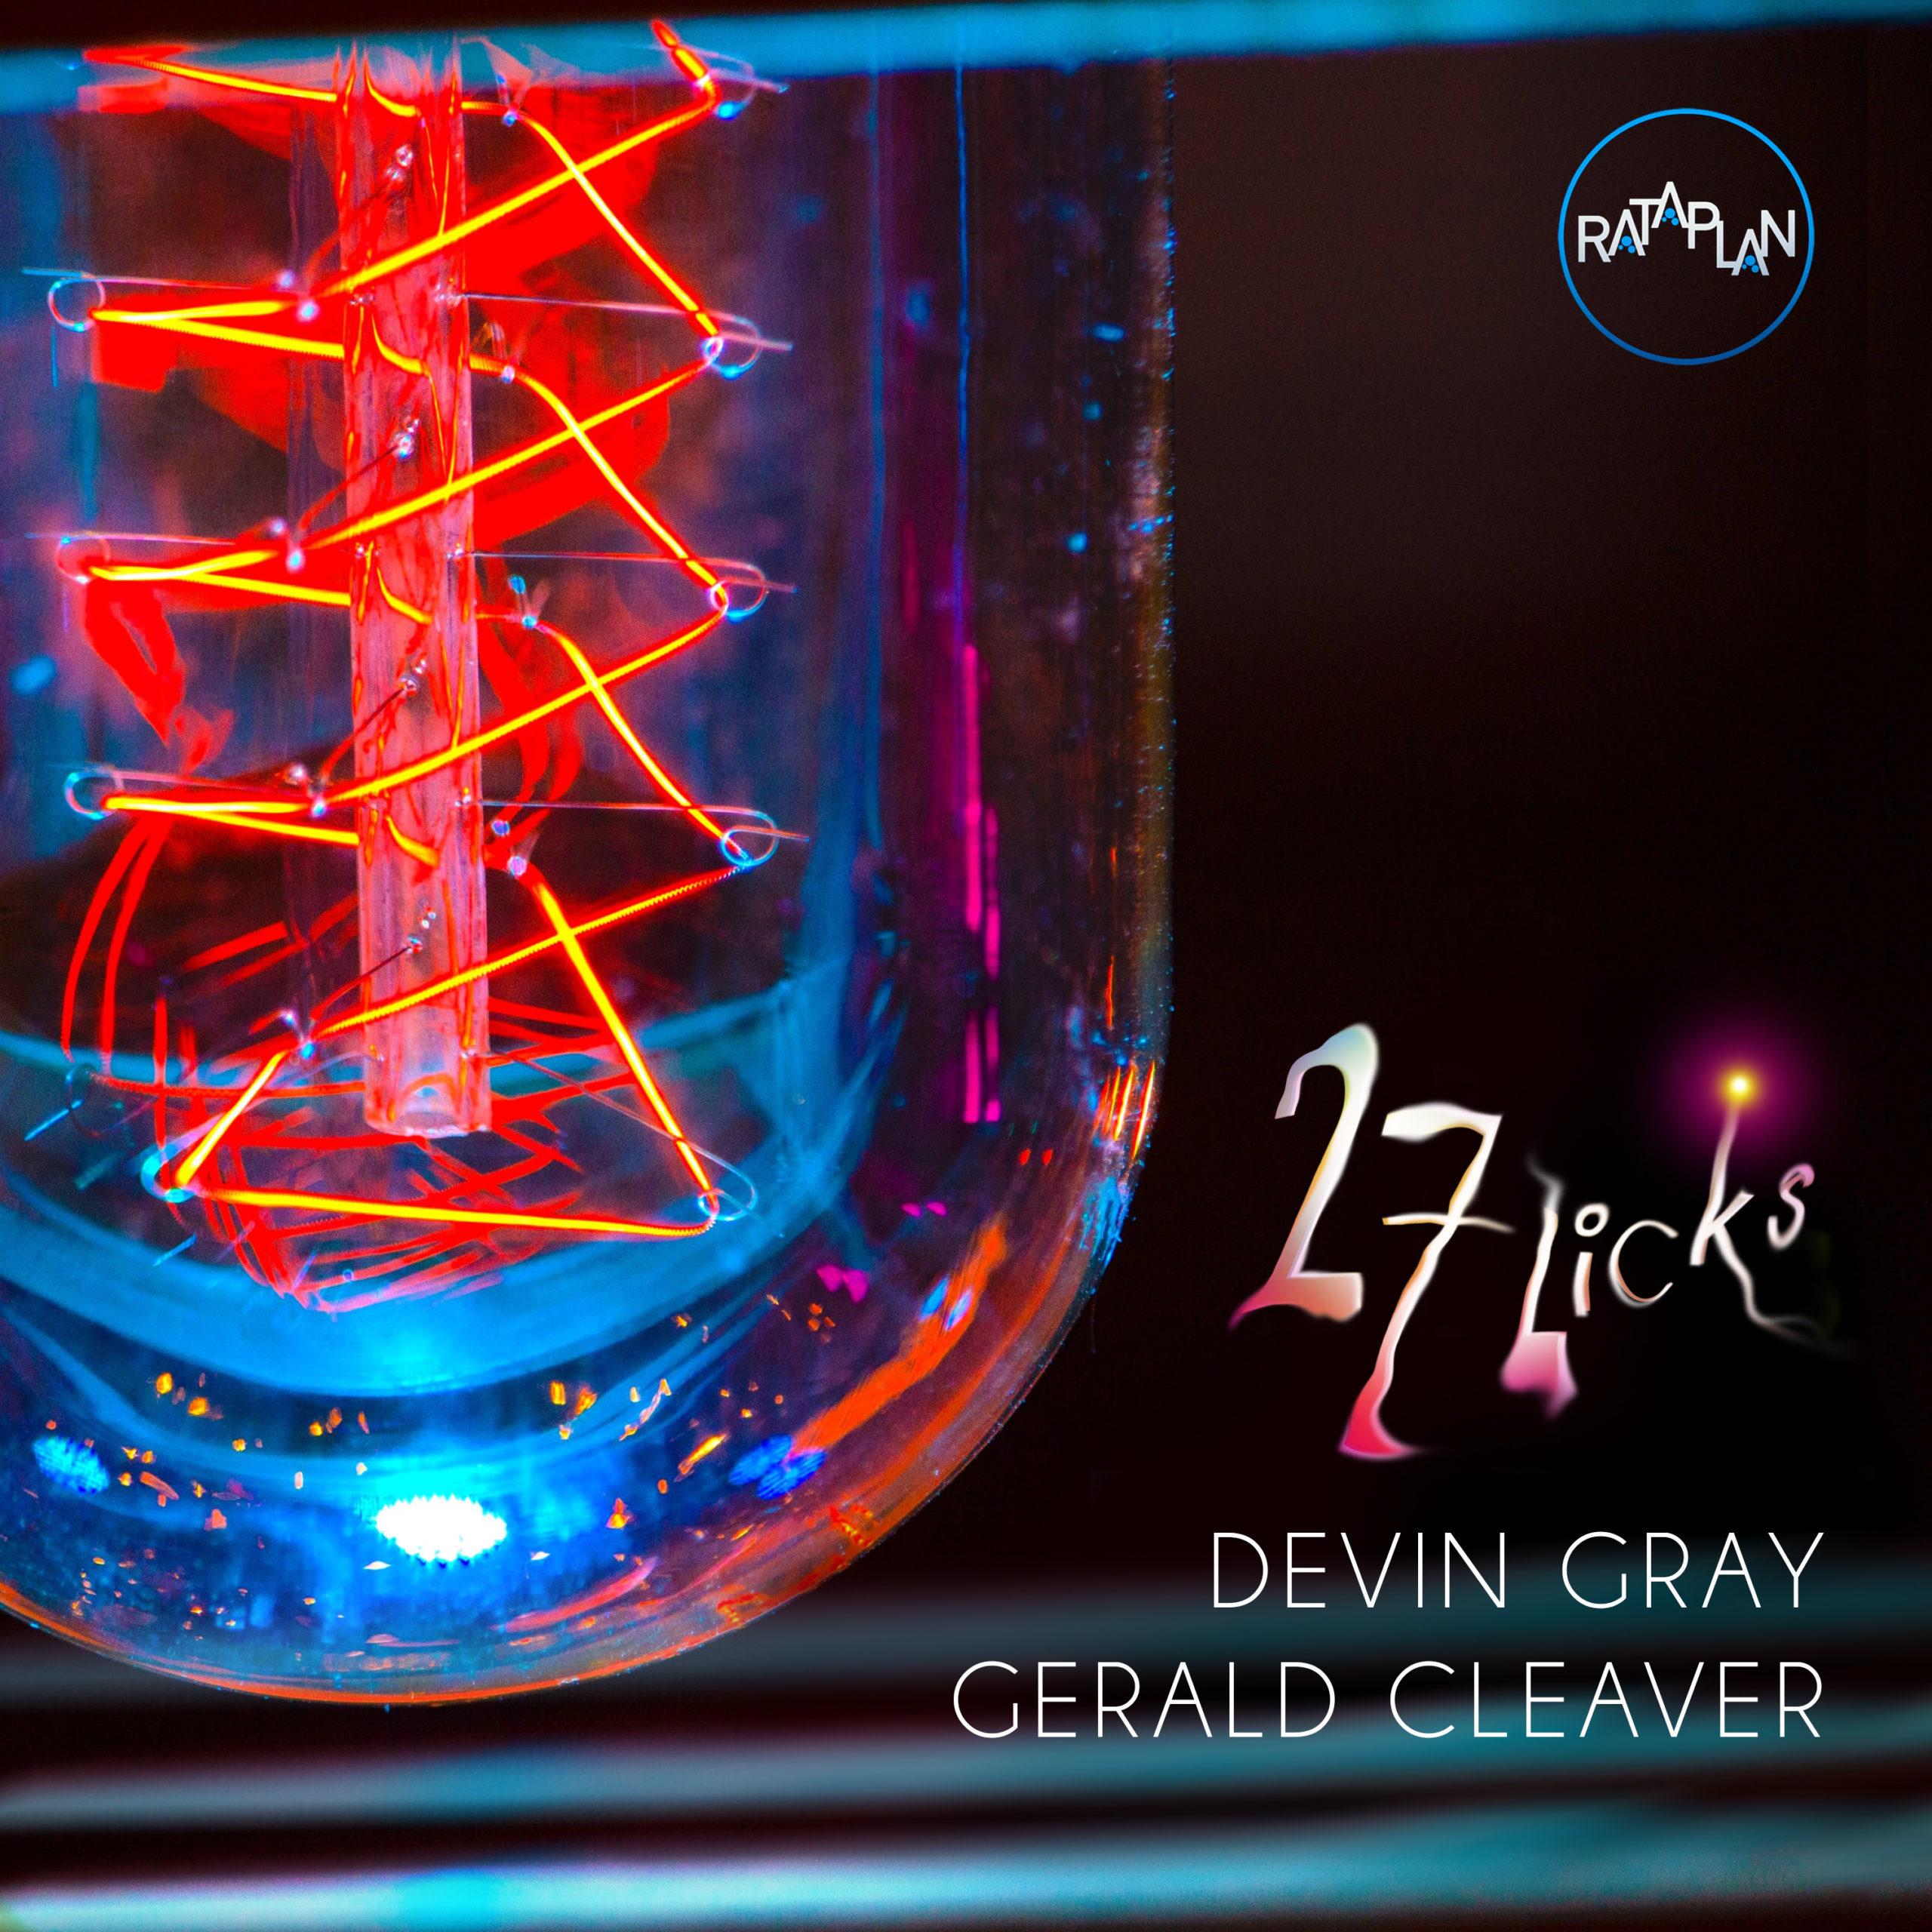 27 Licks de Devin Gray & Gerald Cleaver